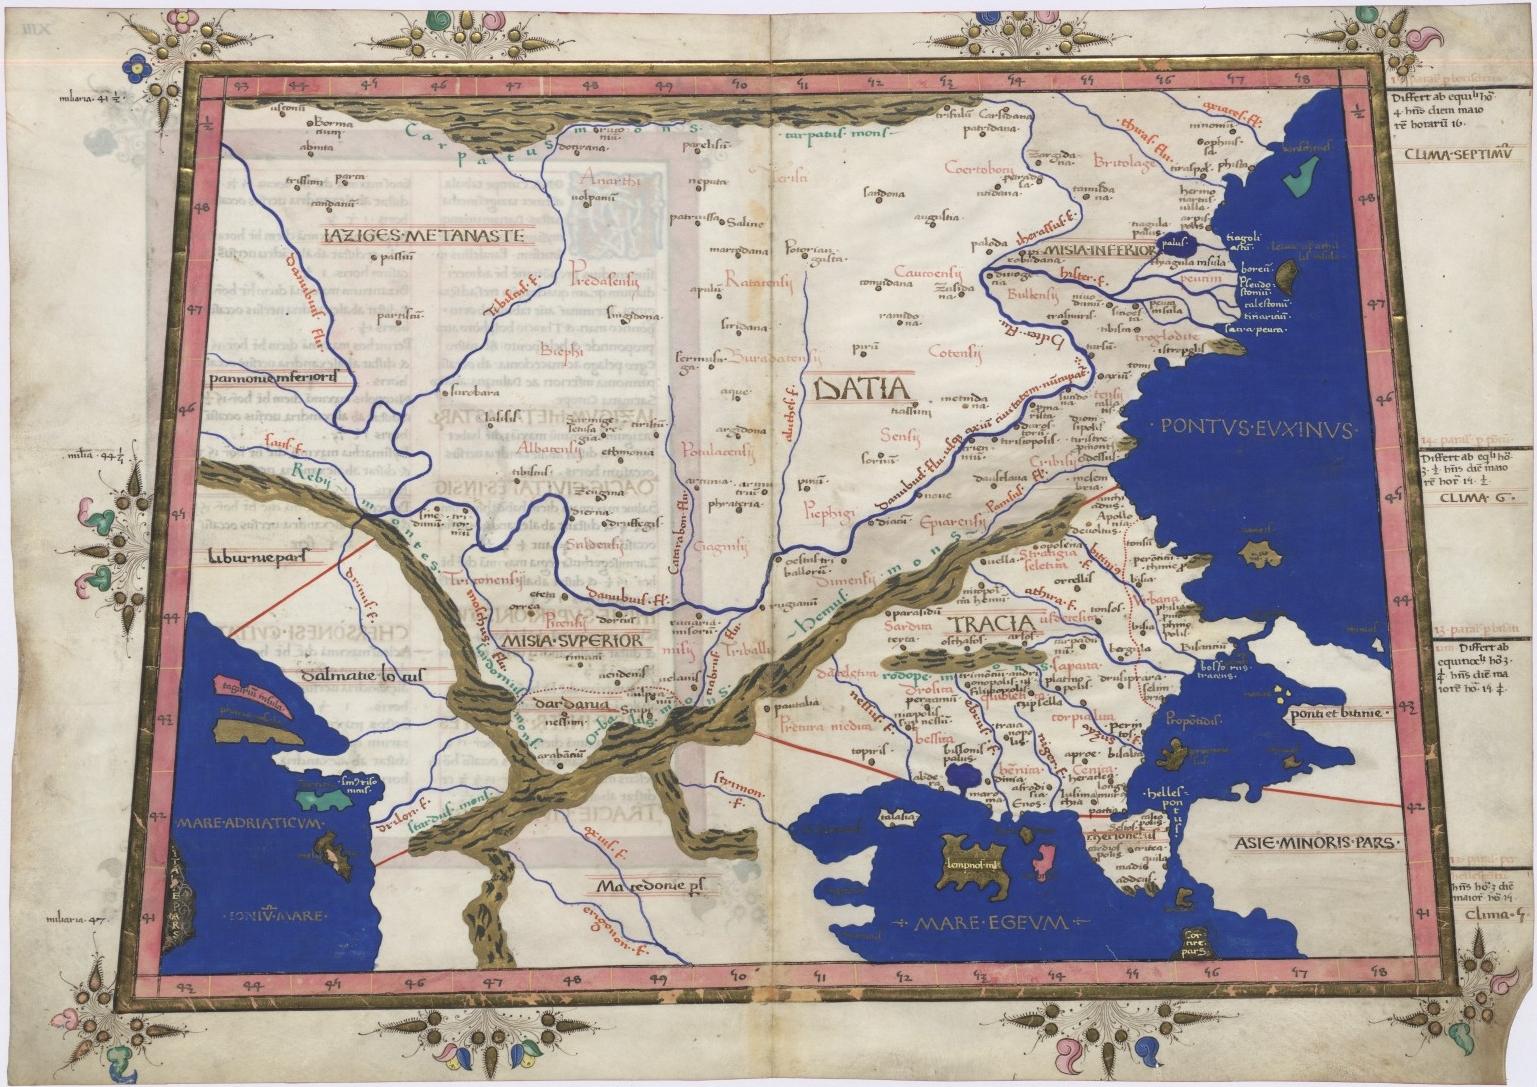 Ptolemy Cosmographia Balkan Peninsula